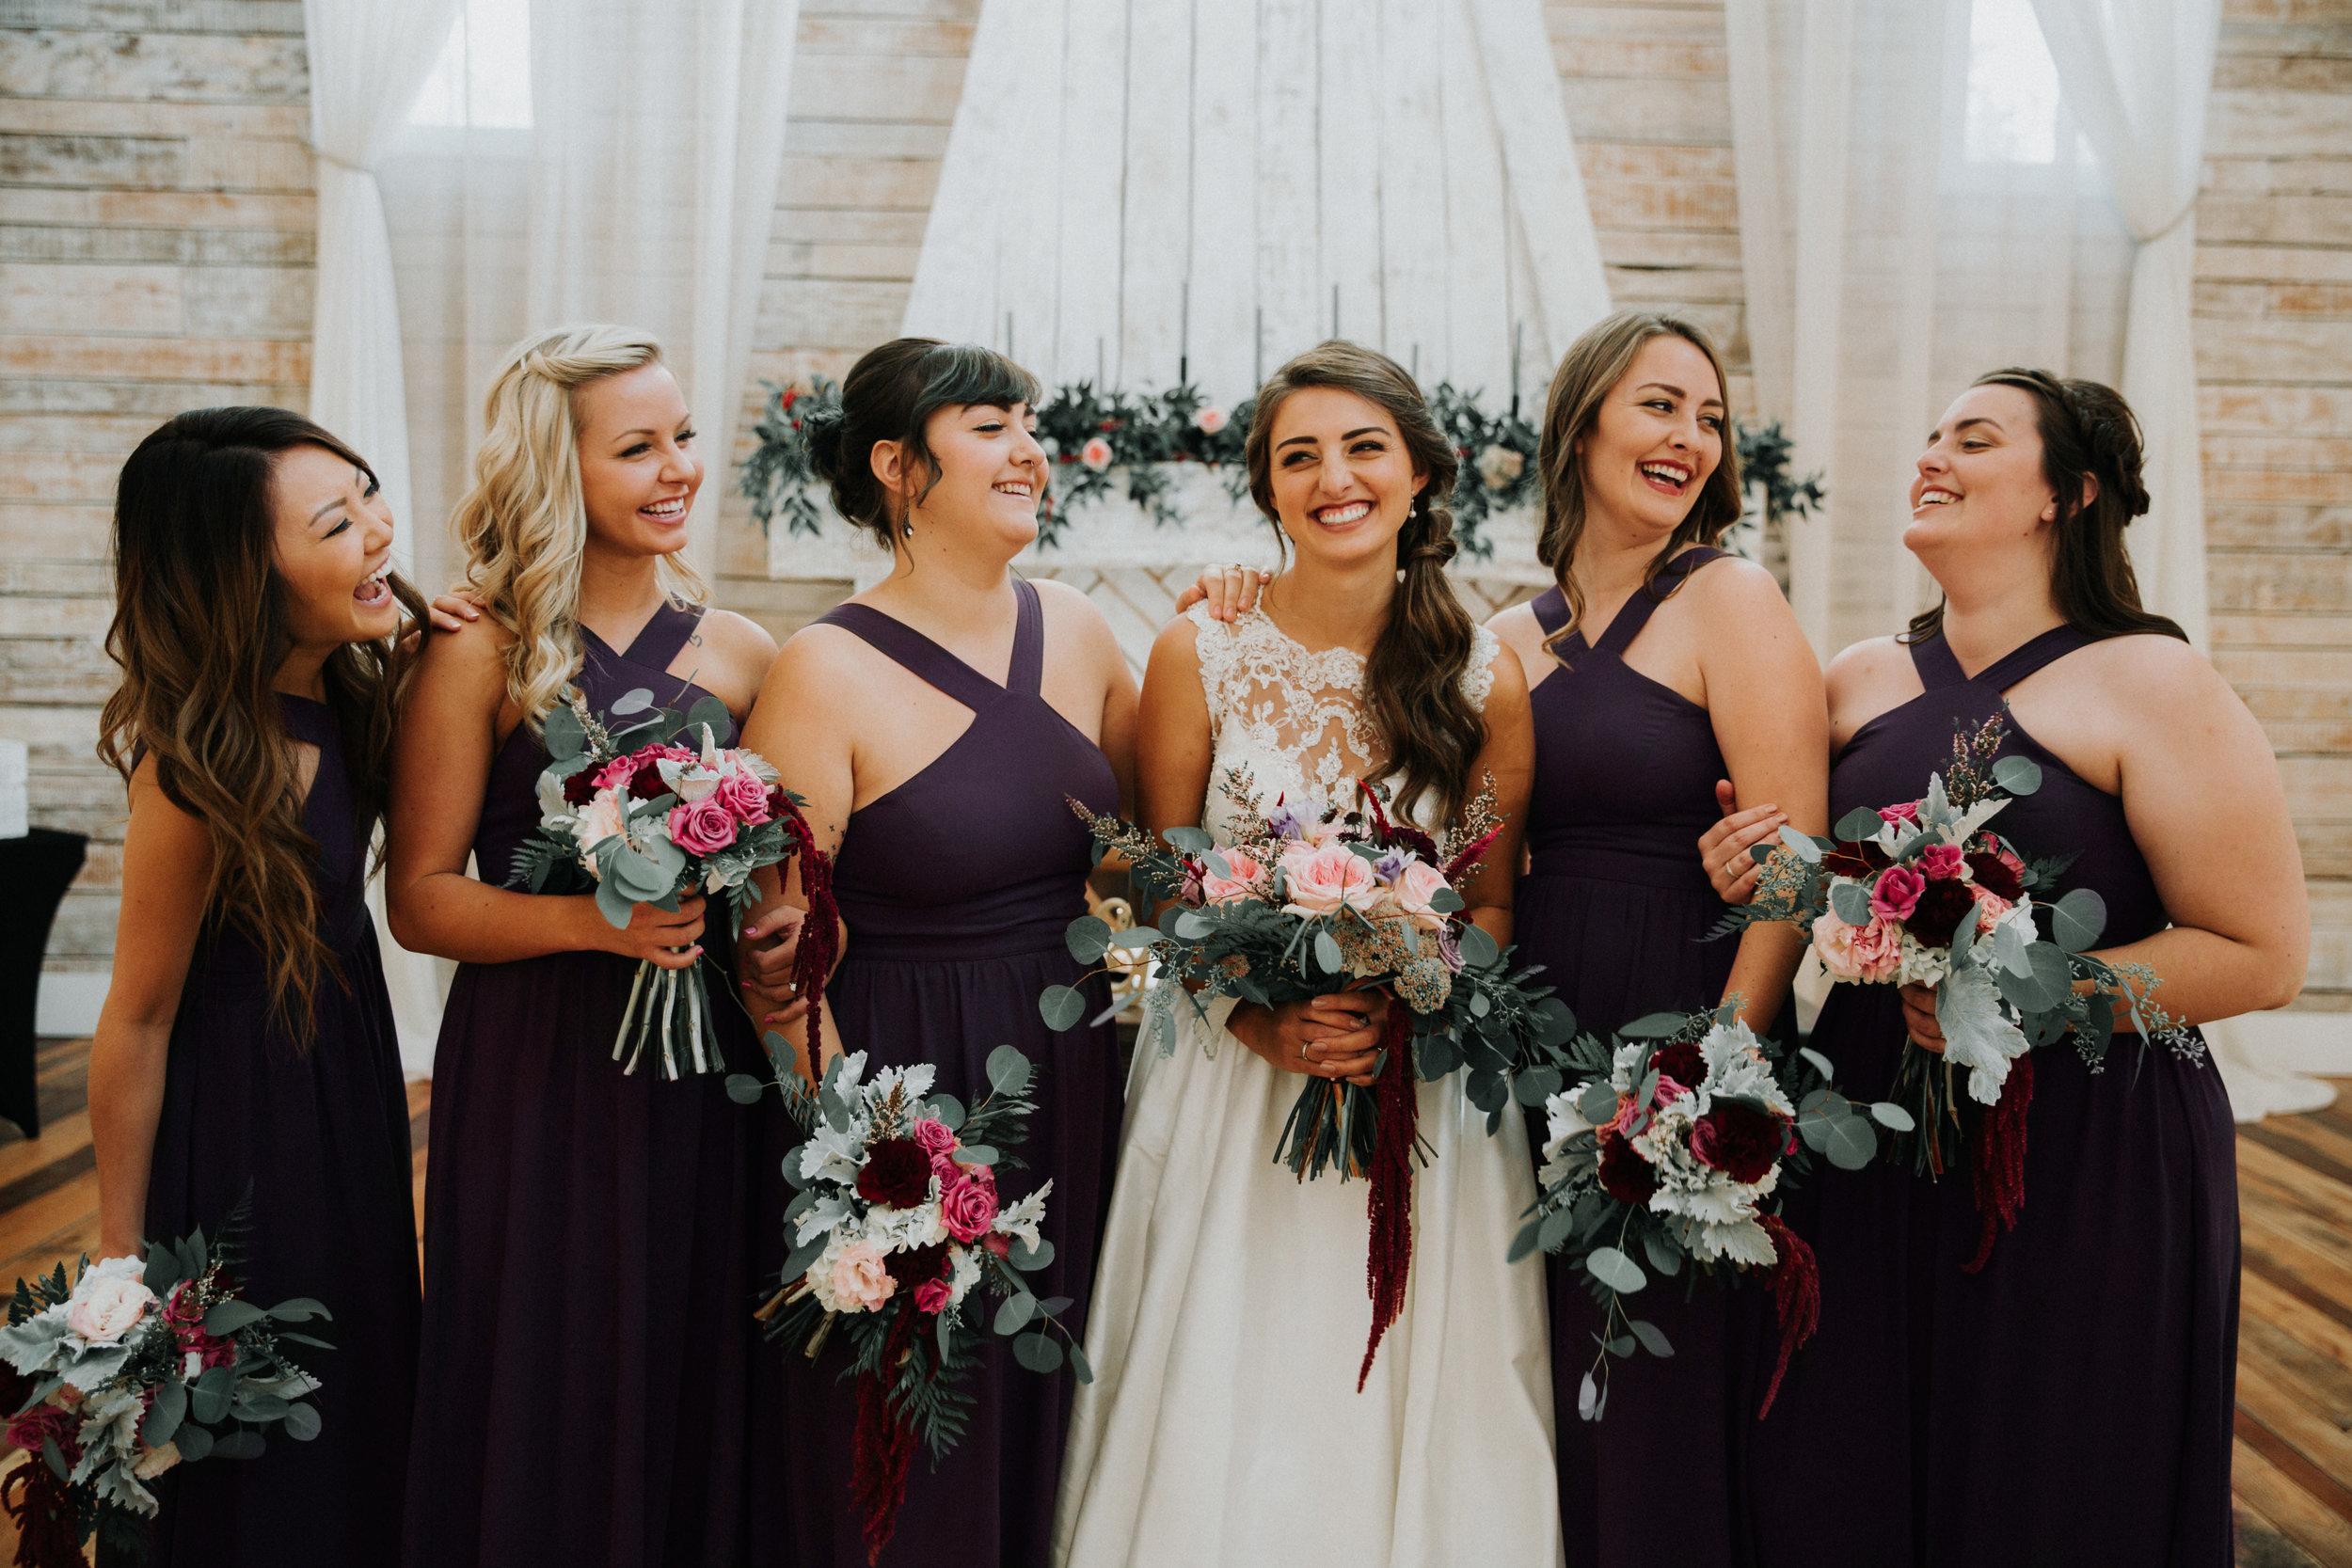 Black Bridesmaid Dresses - Athens, Tennesee Barn Wedding -- The Overwhelmed Bride Wedding Blog